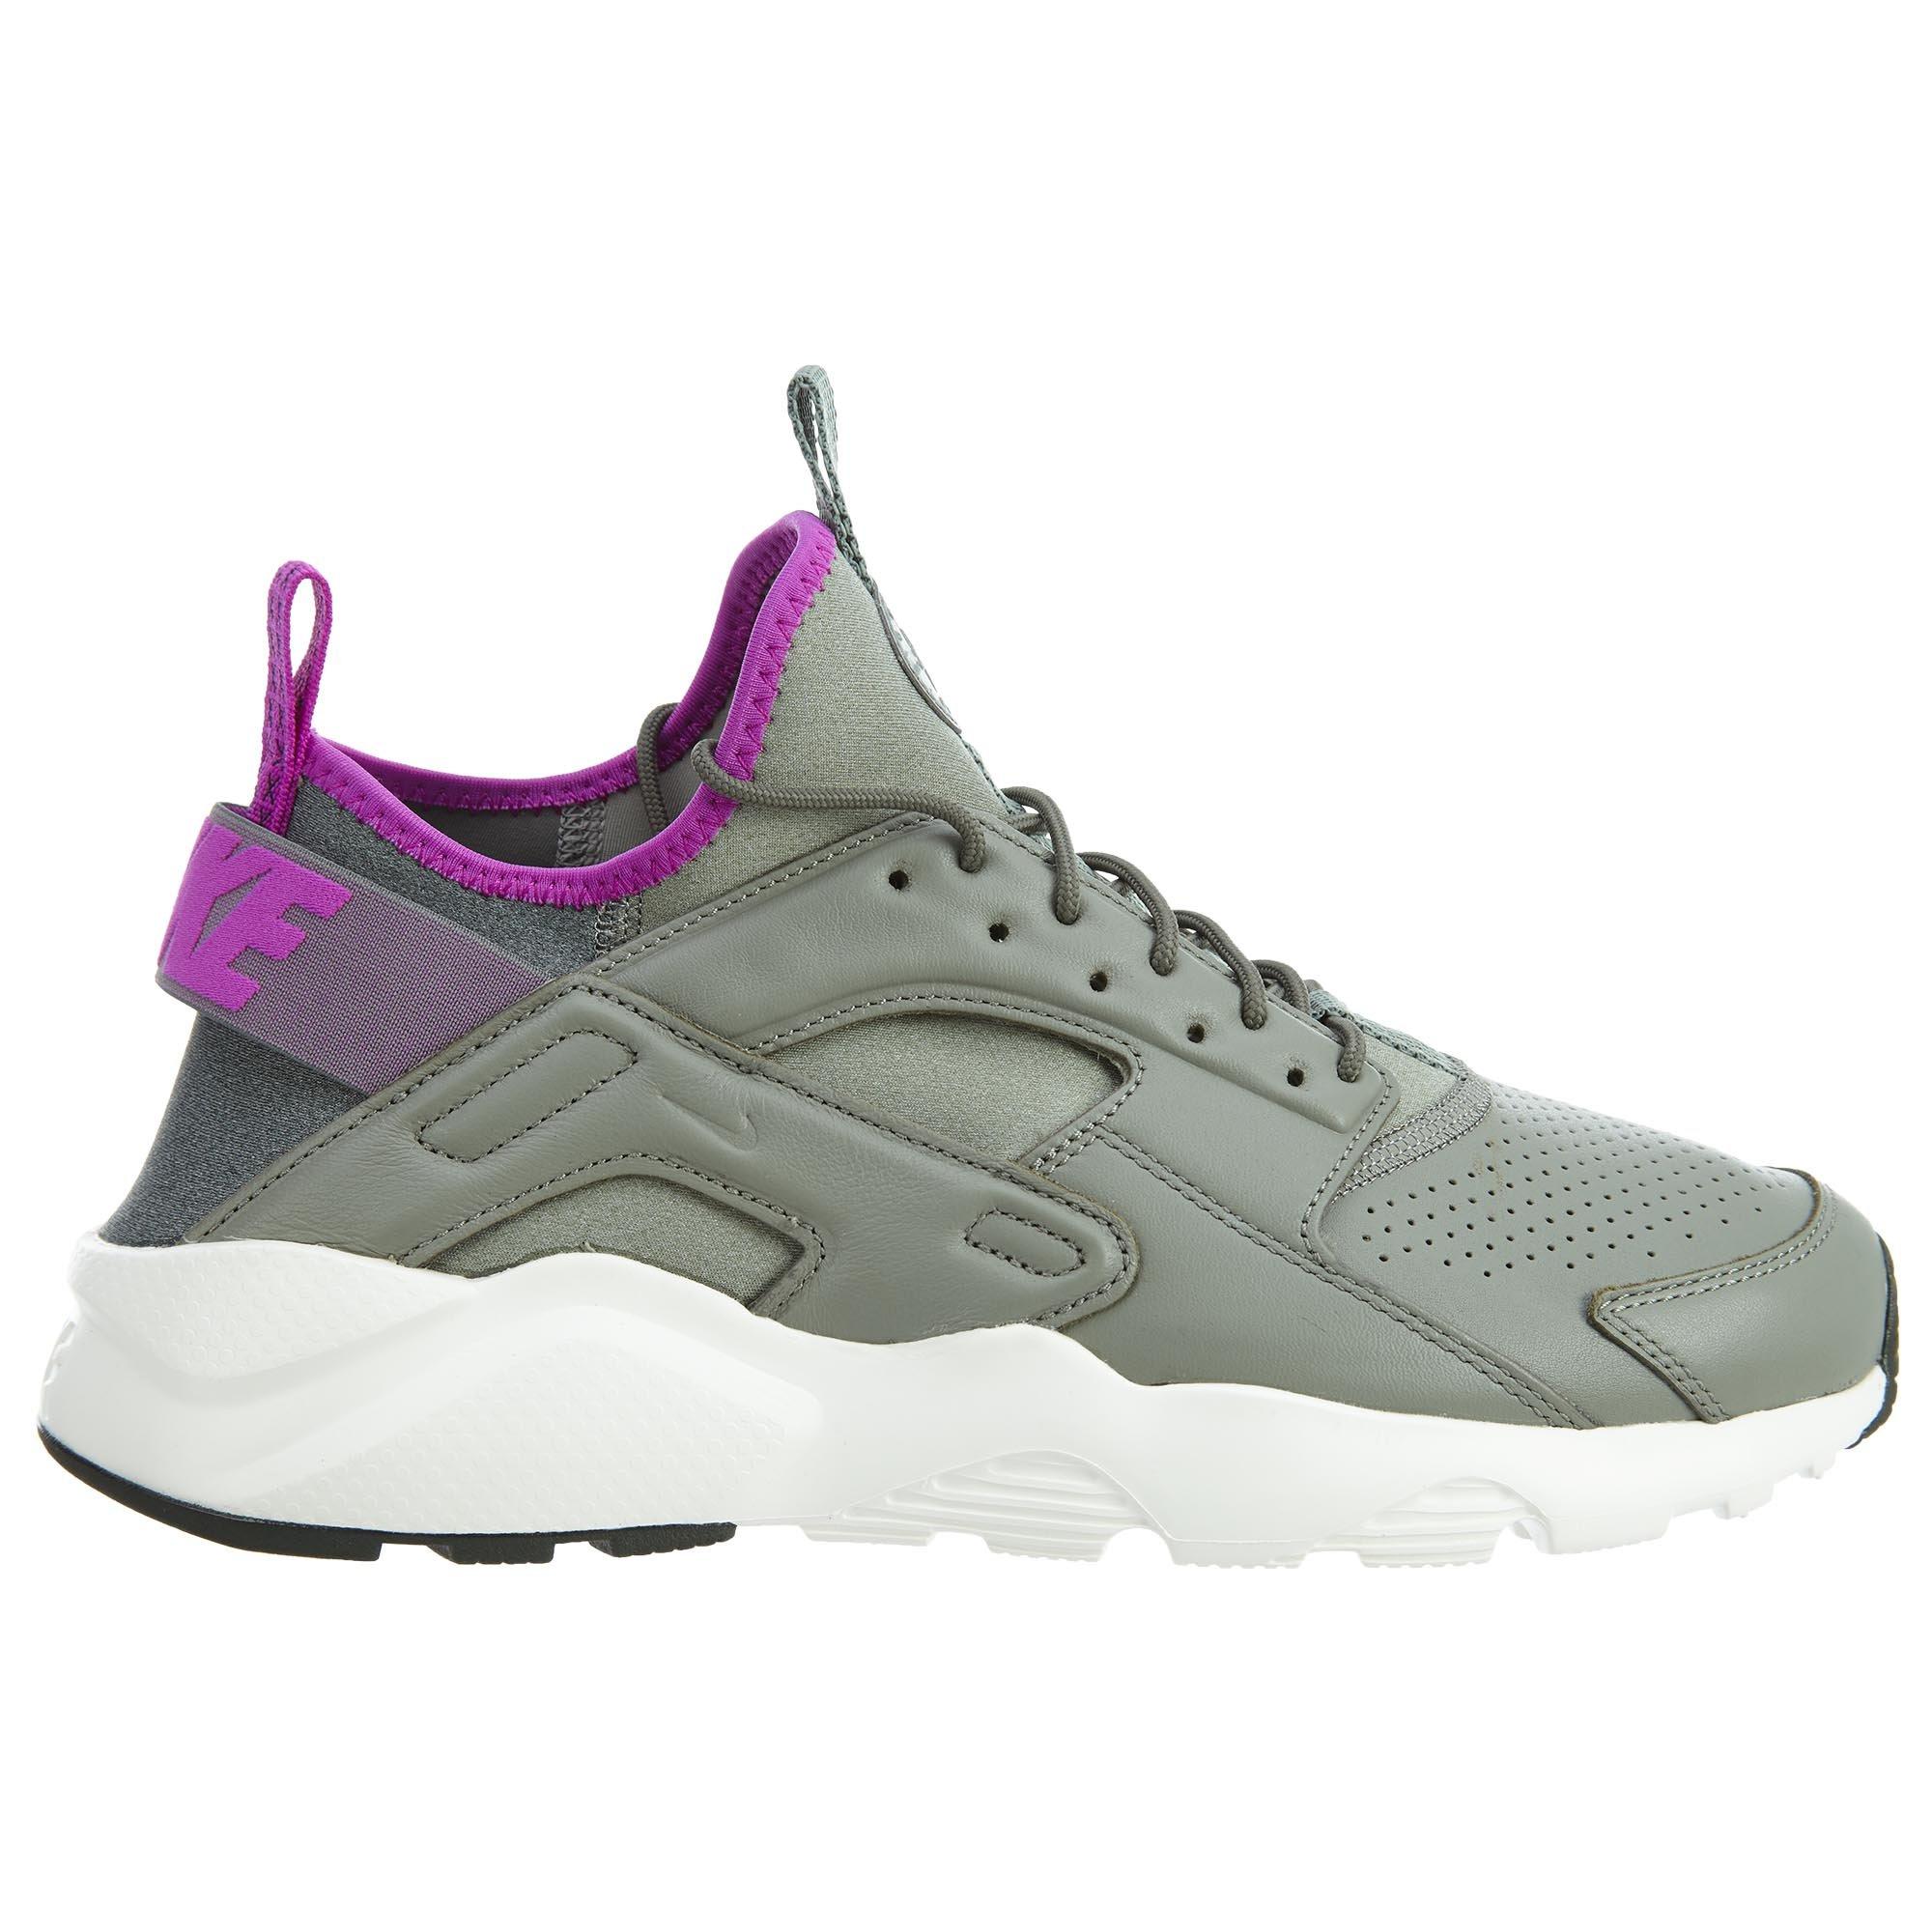 Nike Air Huarache Run Ultra Se Mens Style: 875841-003 Size: 9 M US